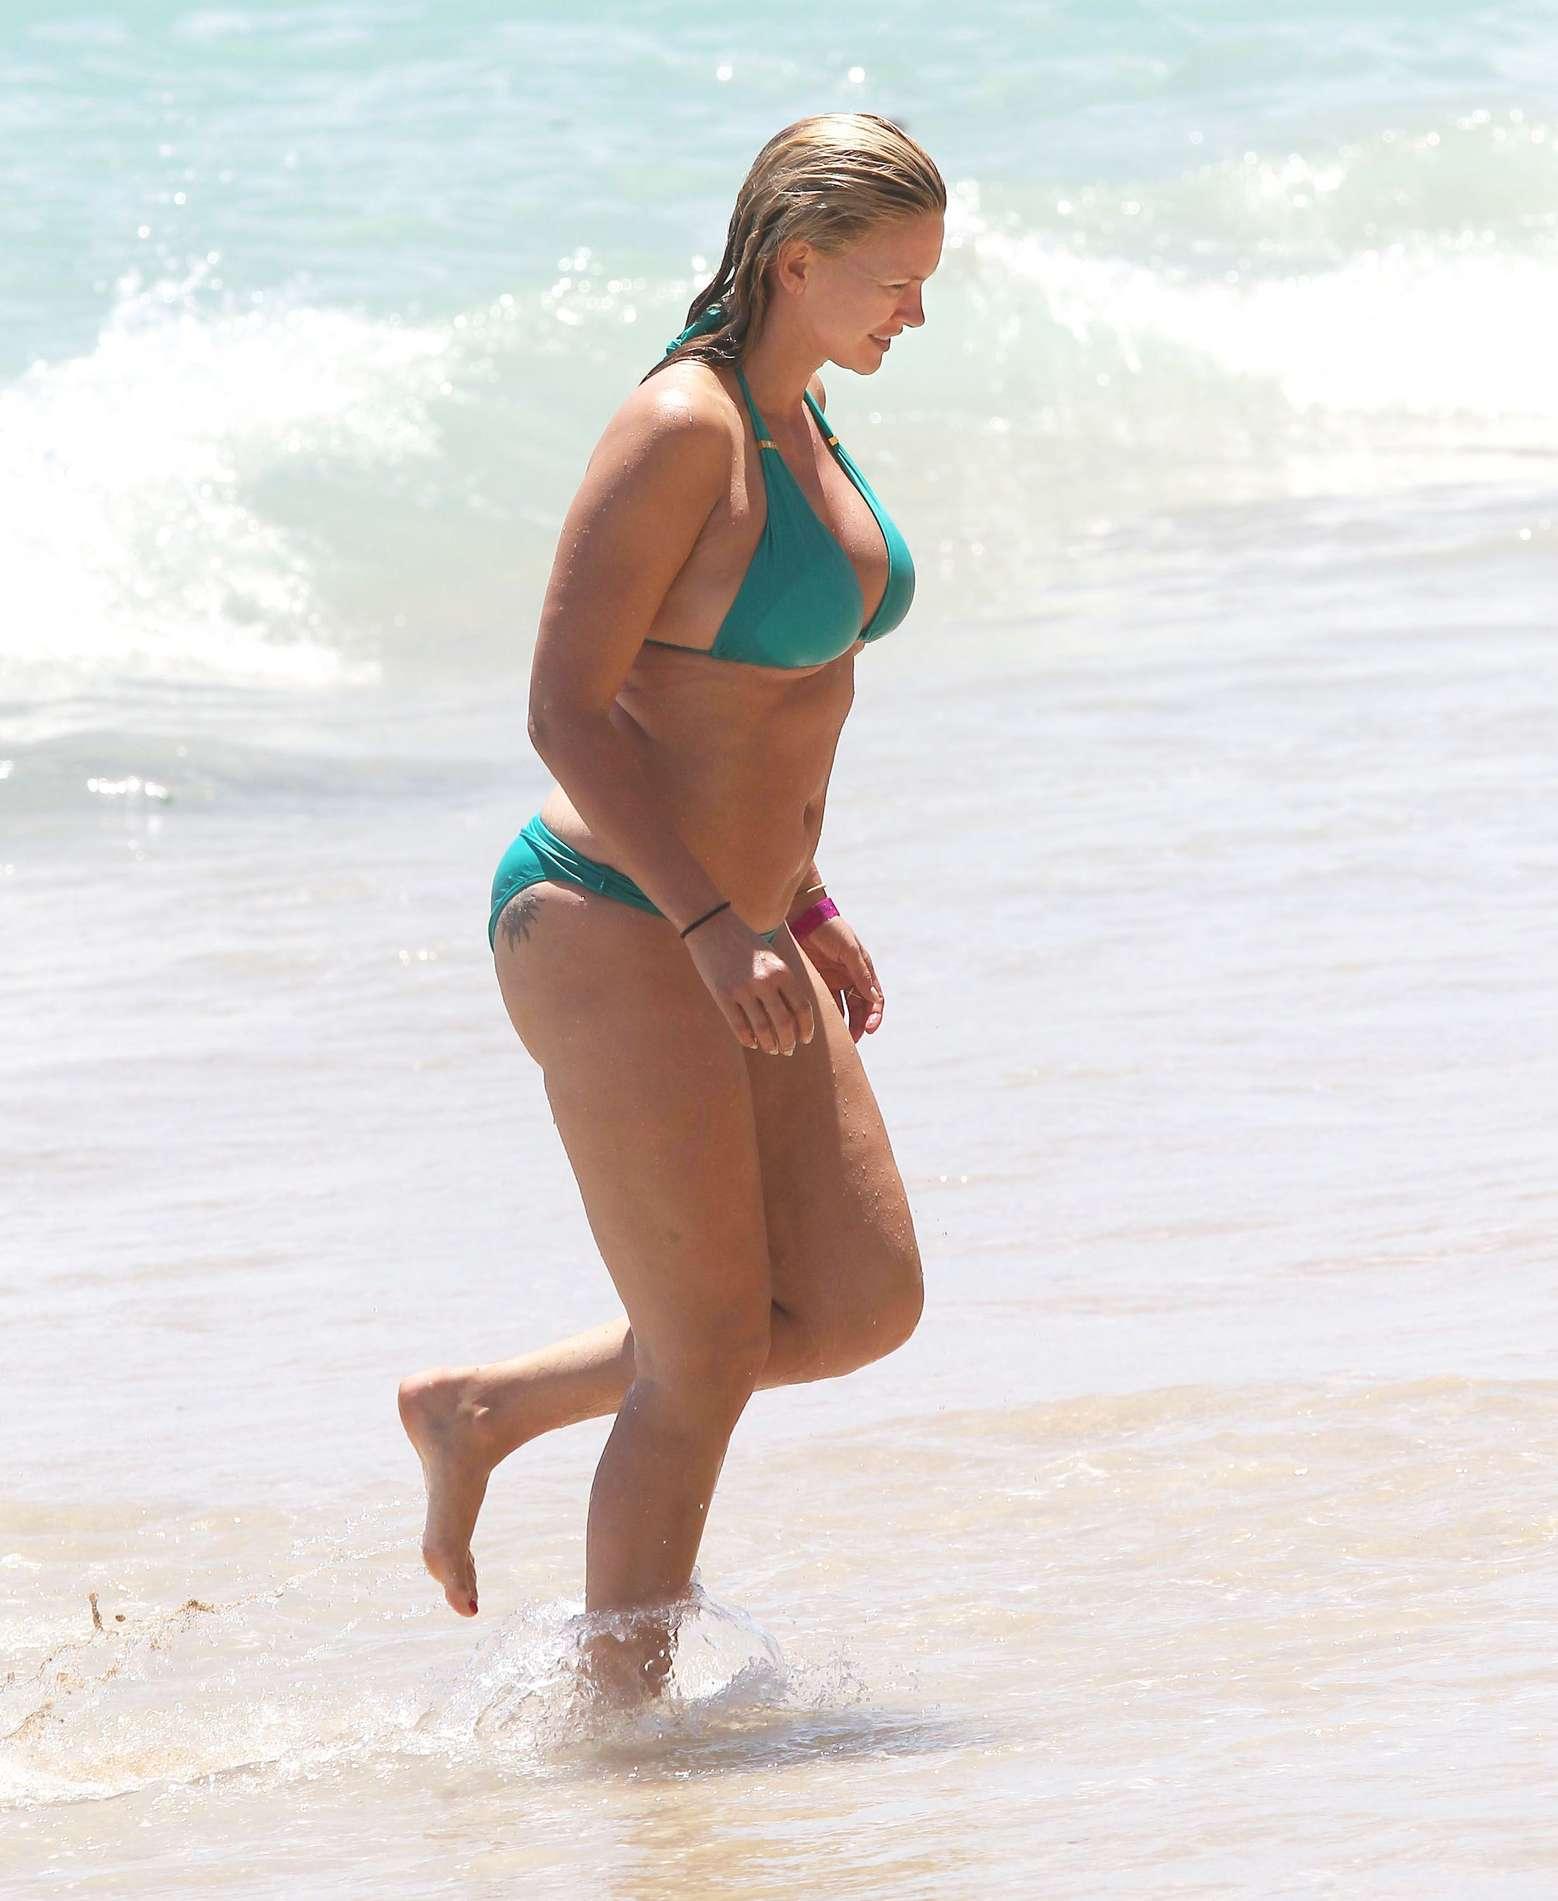 natasha henstridge nude at the beach